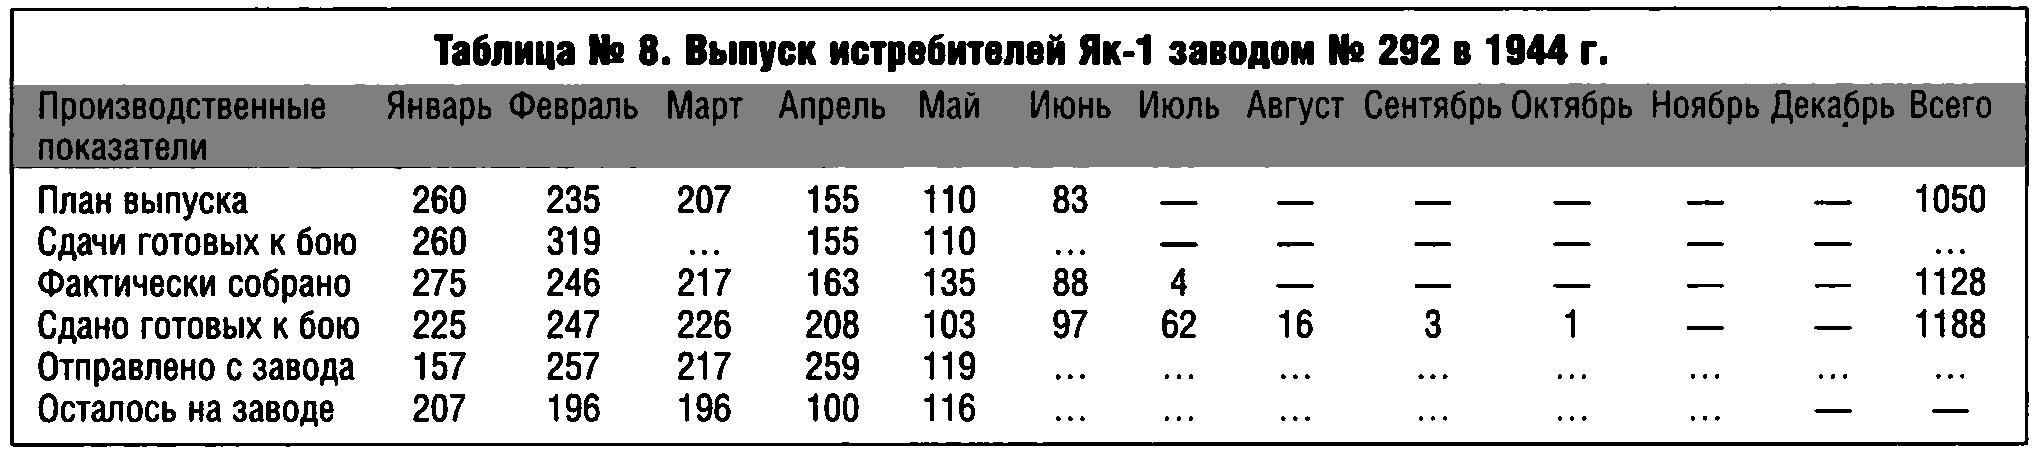 Производство Як-1 в 1944 (зад. 292).png